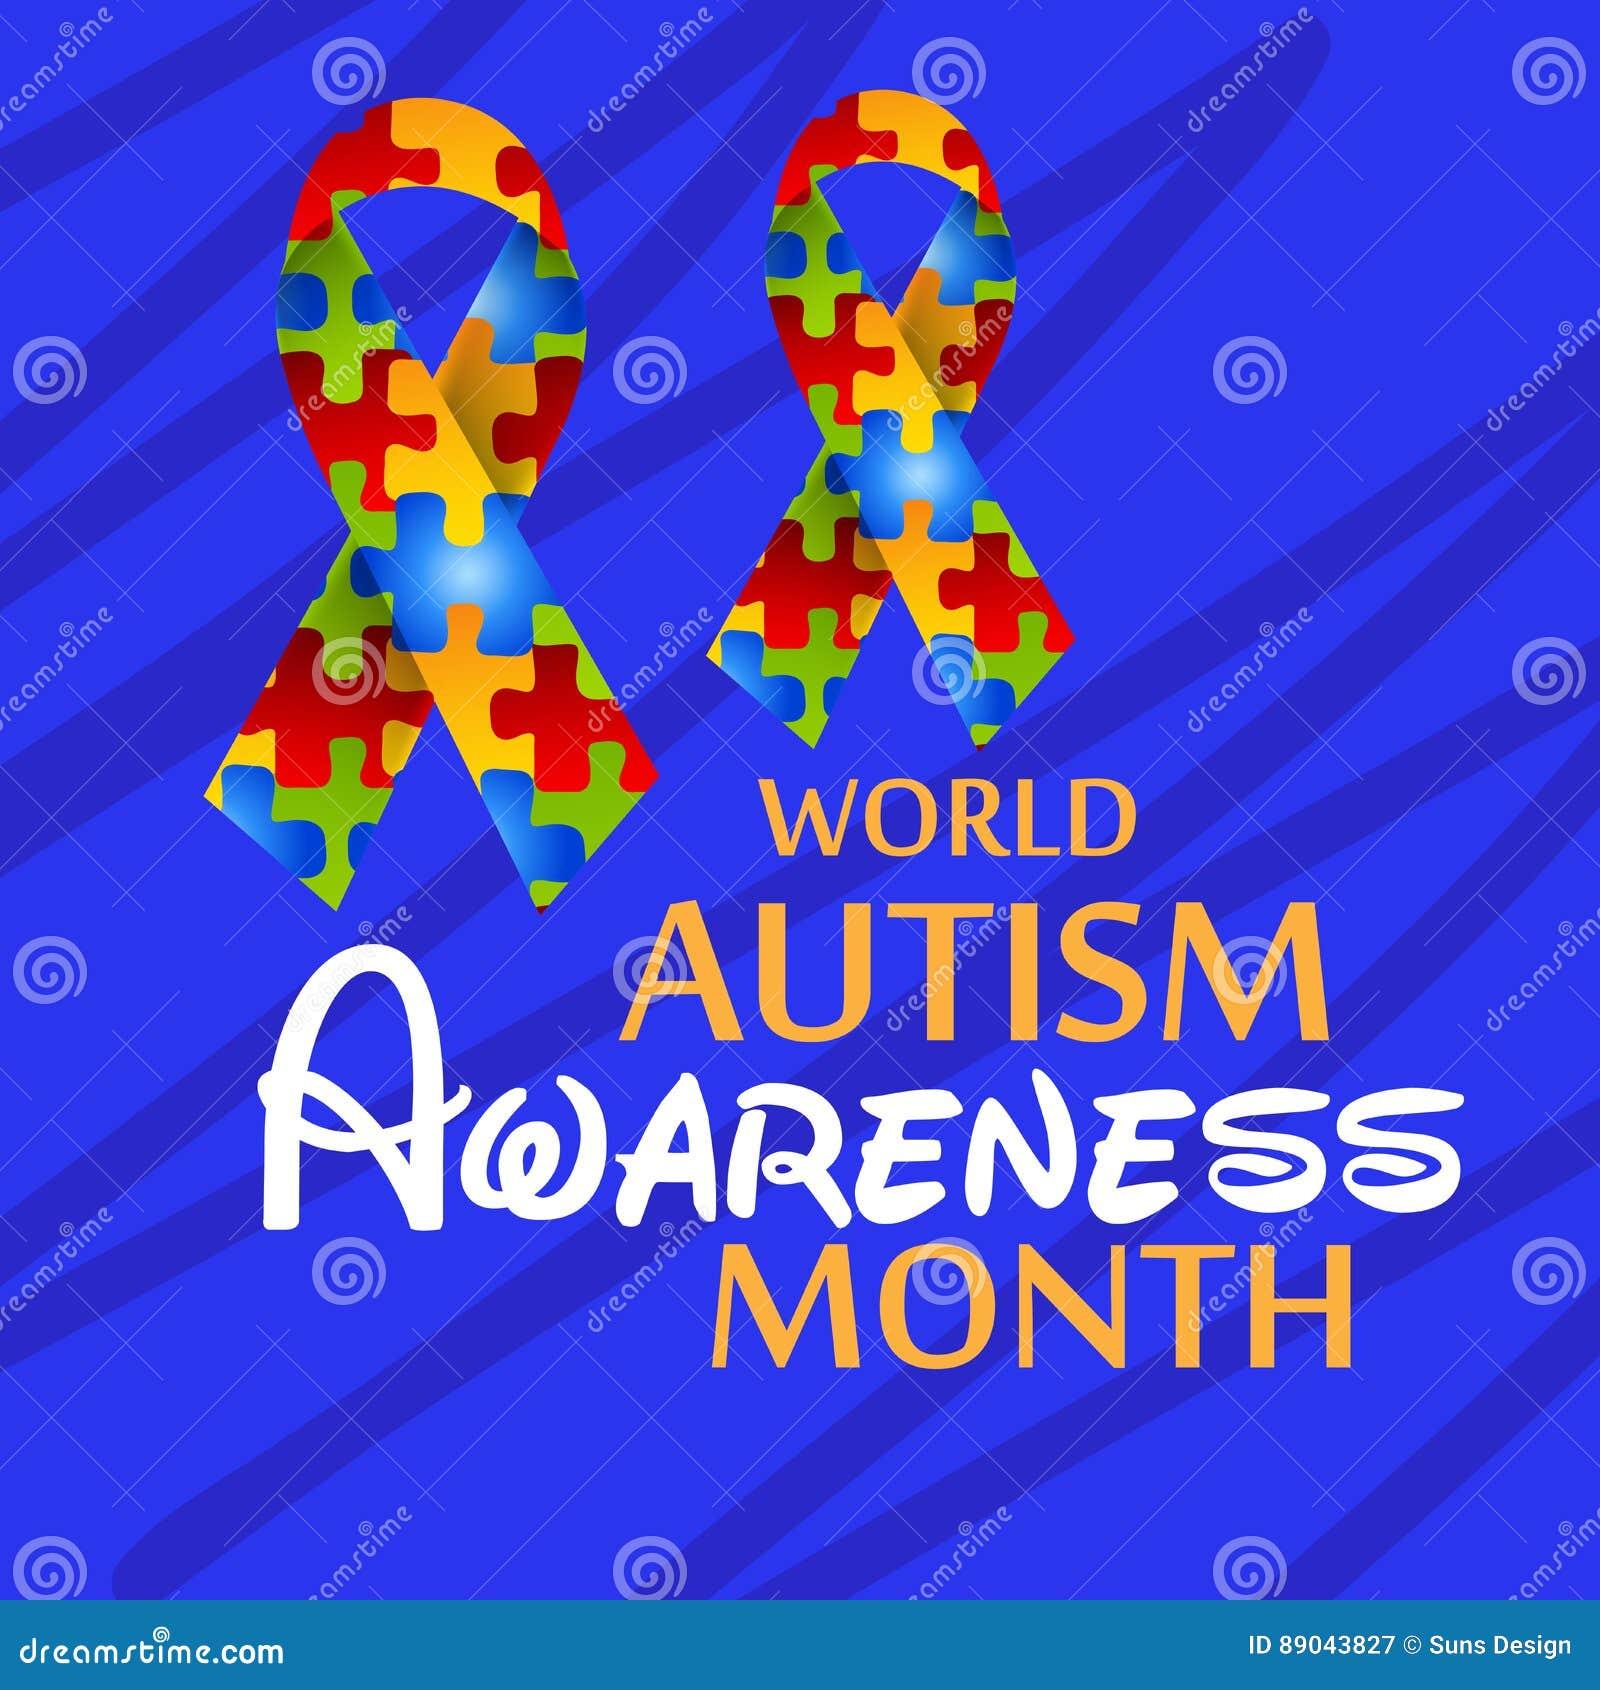 world autism awareness day stock illustration illustration of